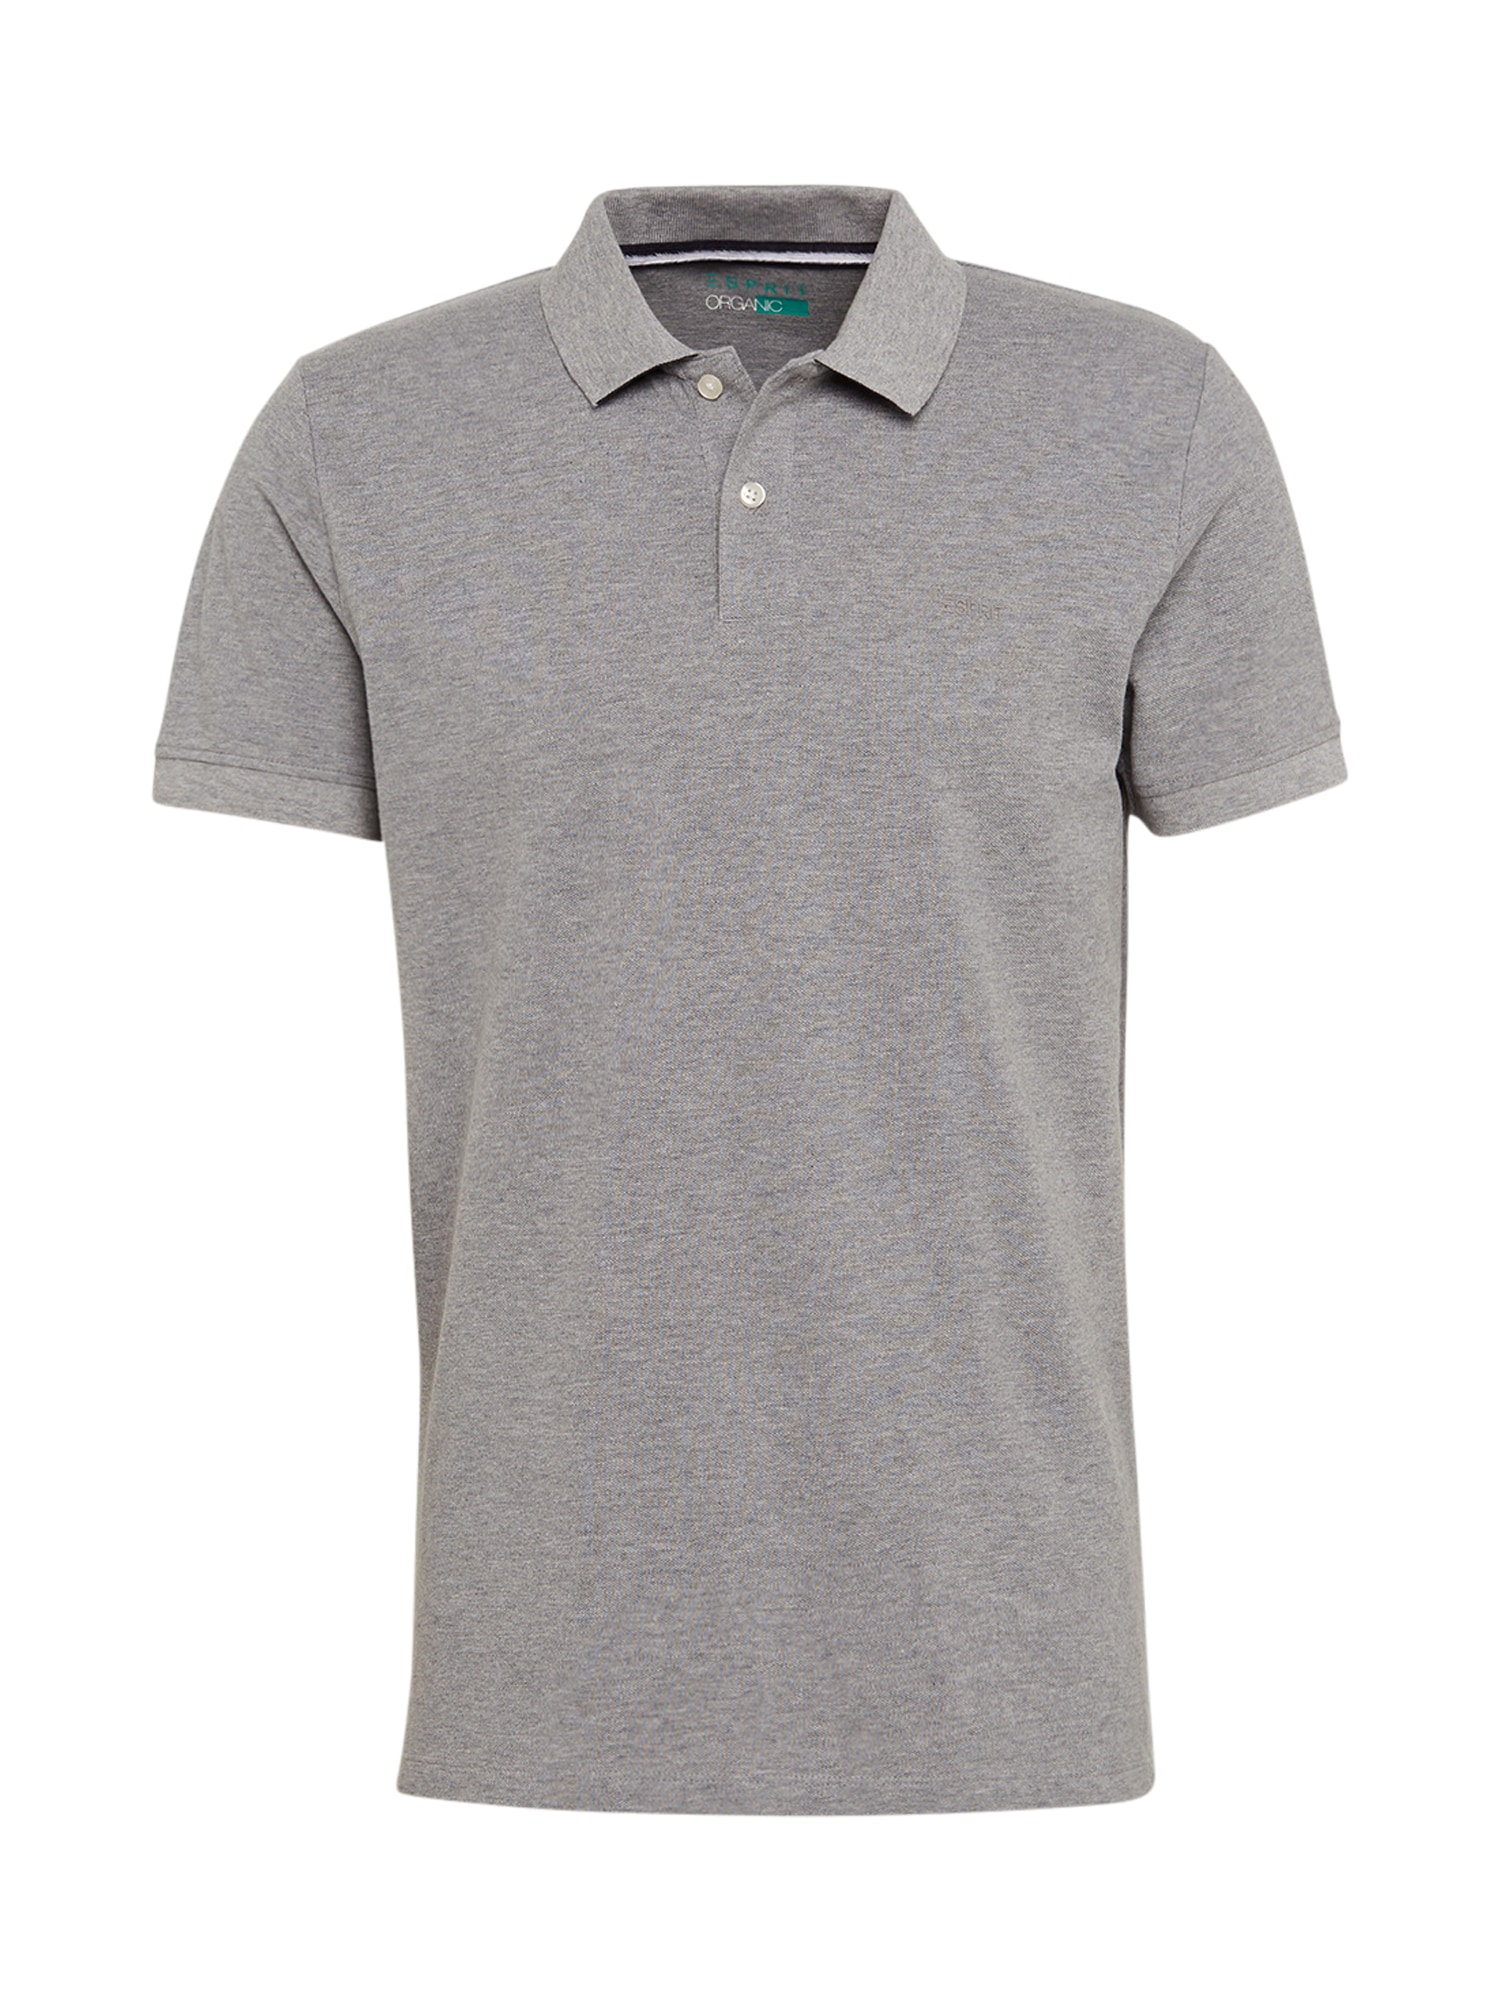 ESPRIT Marškinėliai 'OCS N pi po ss' pilka